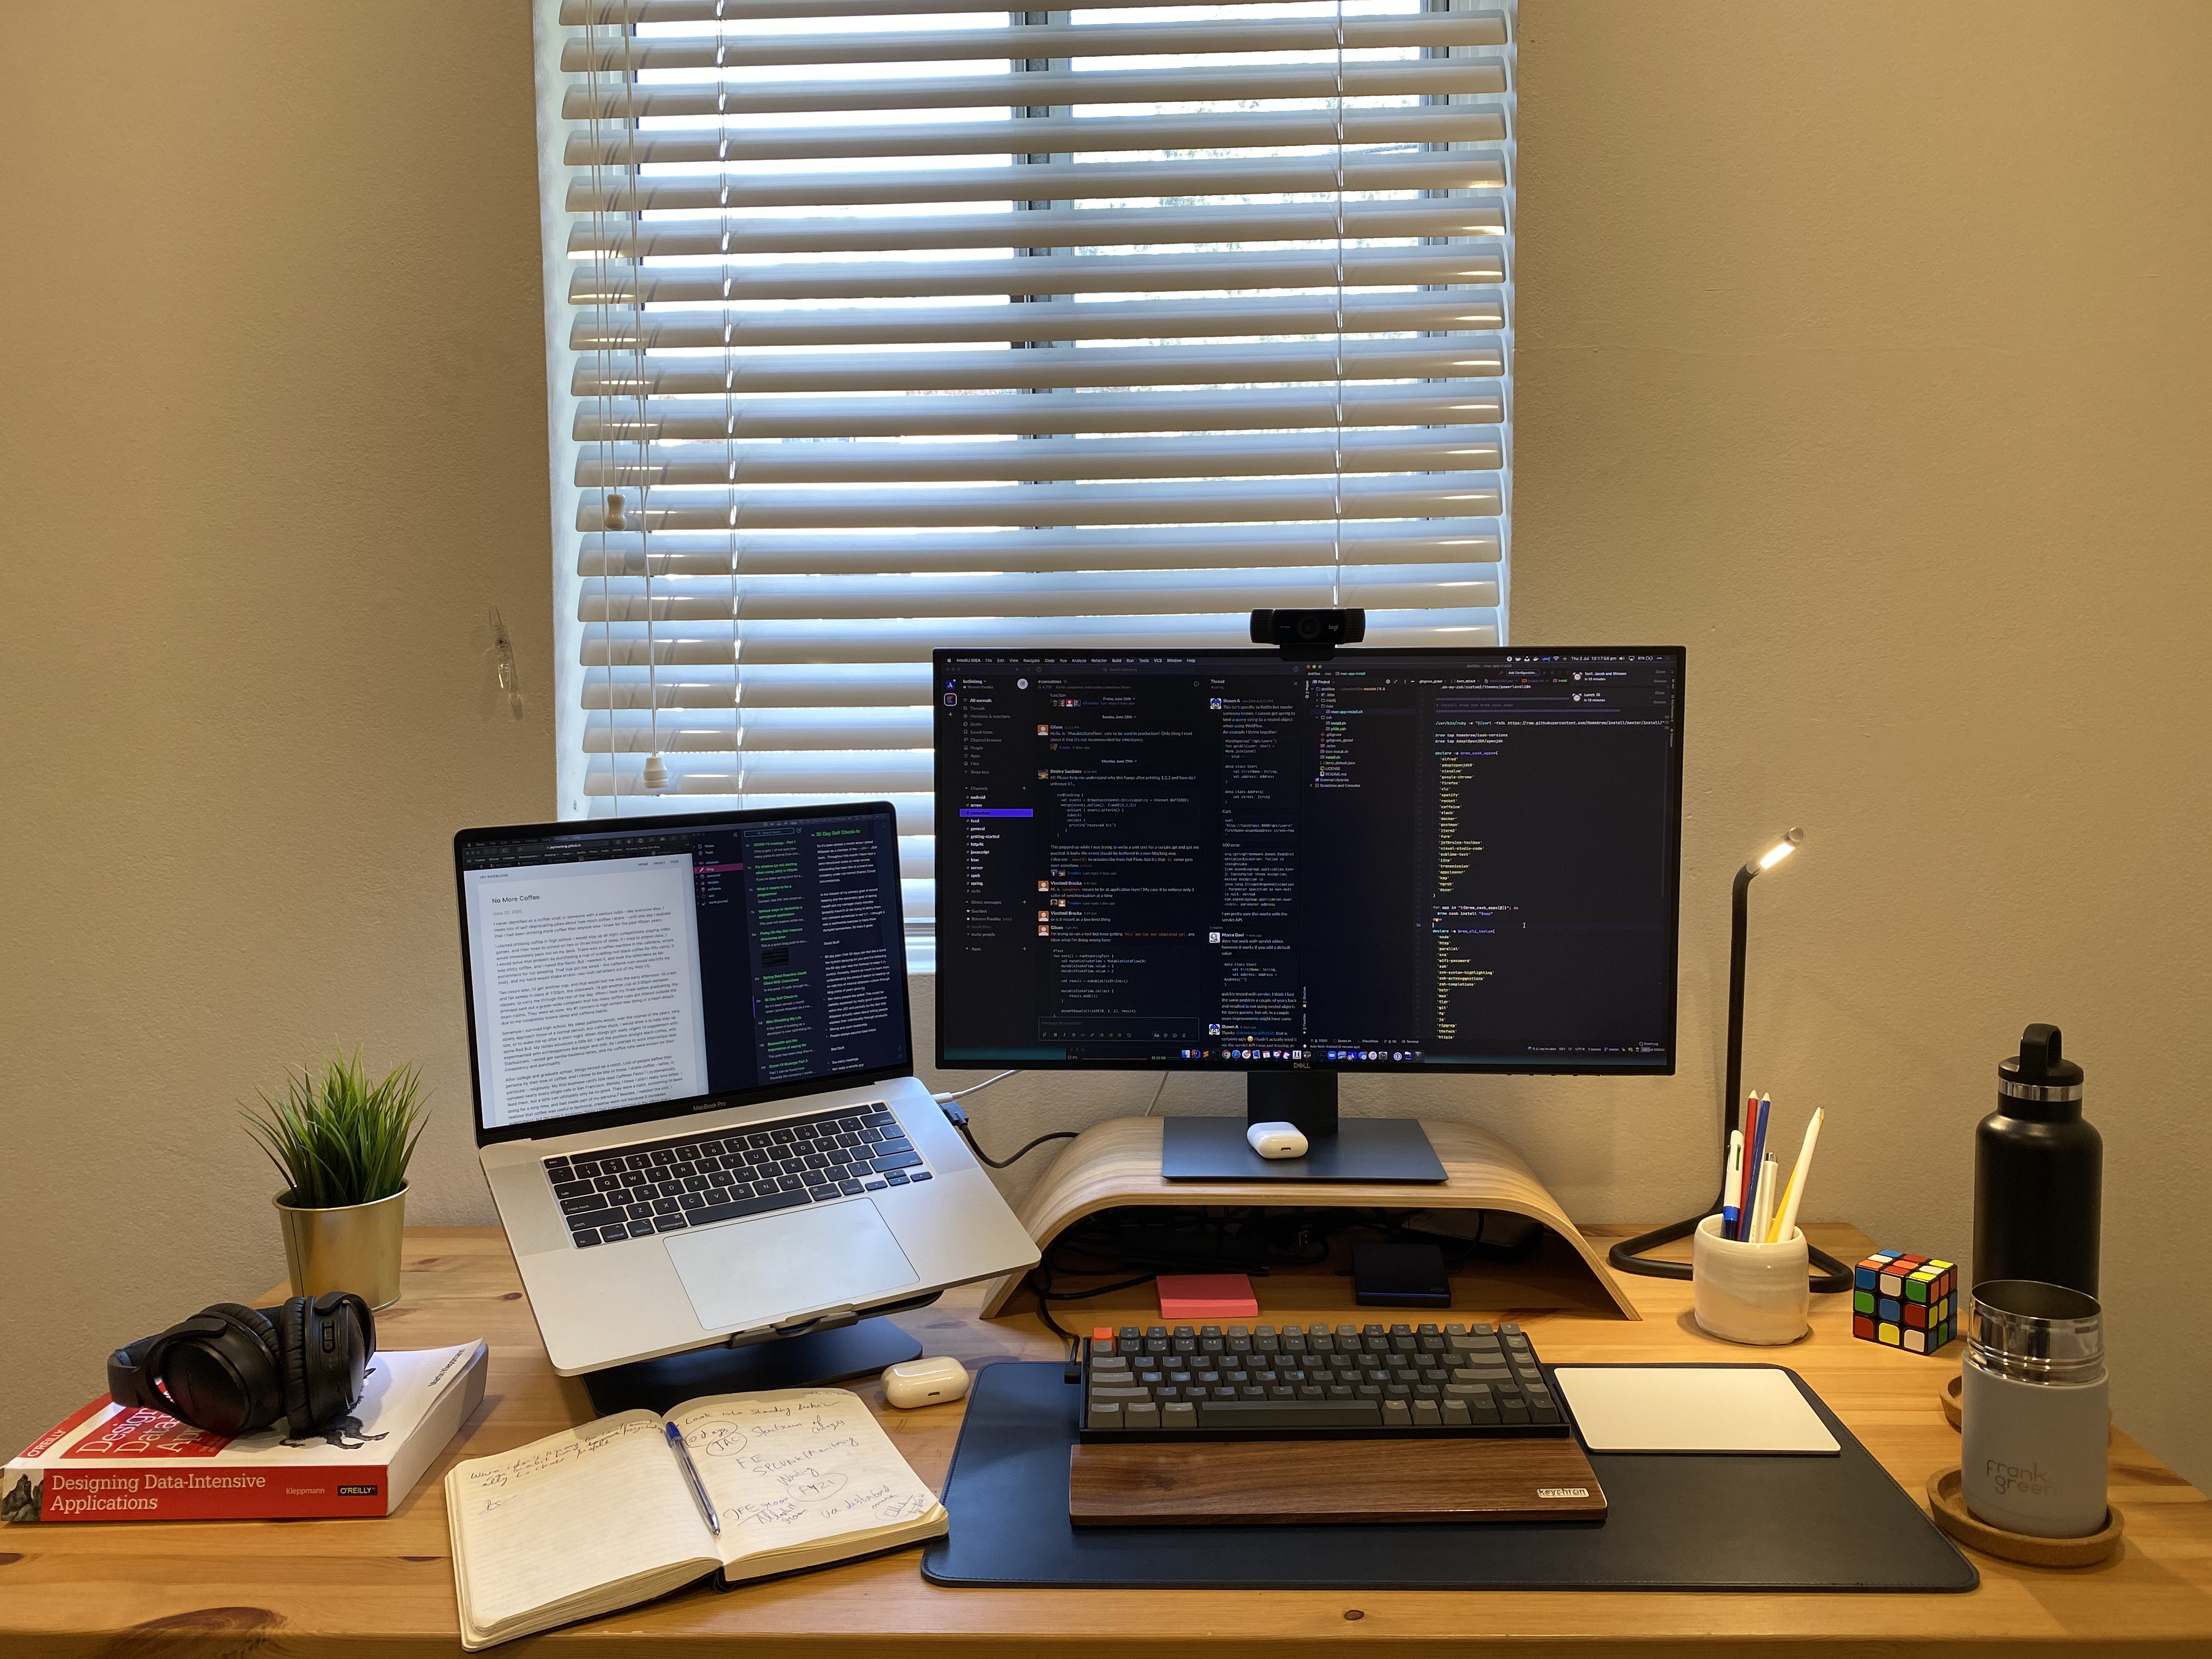 Mac OS specs Image